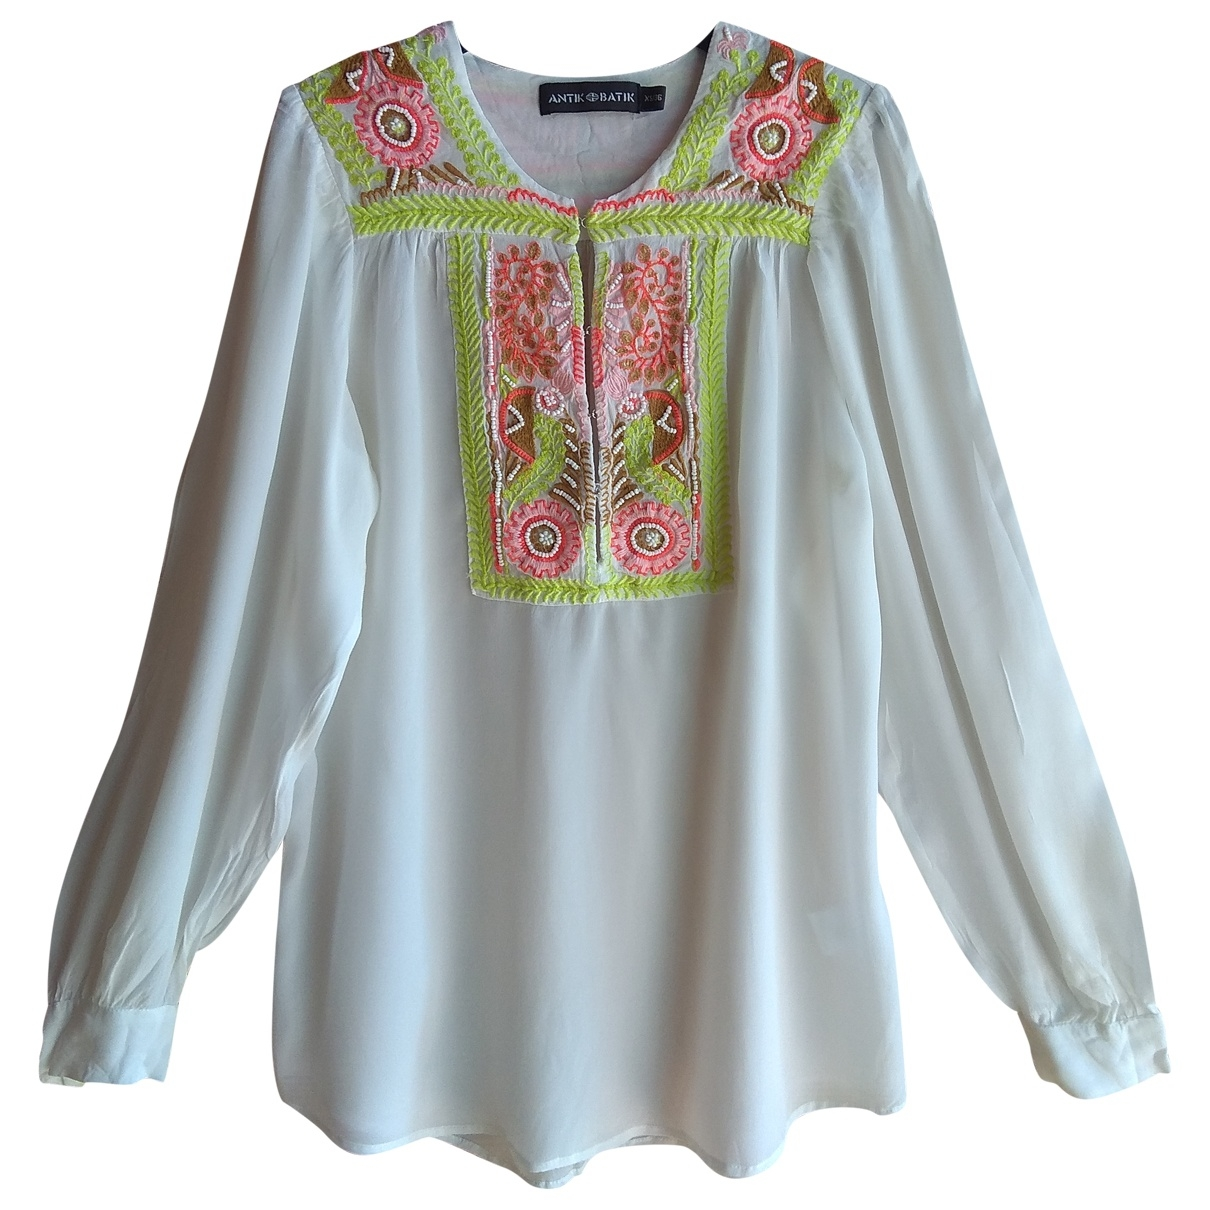 Antik Batik - Top   pour femme - blanc